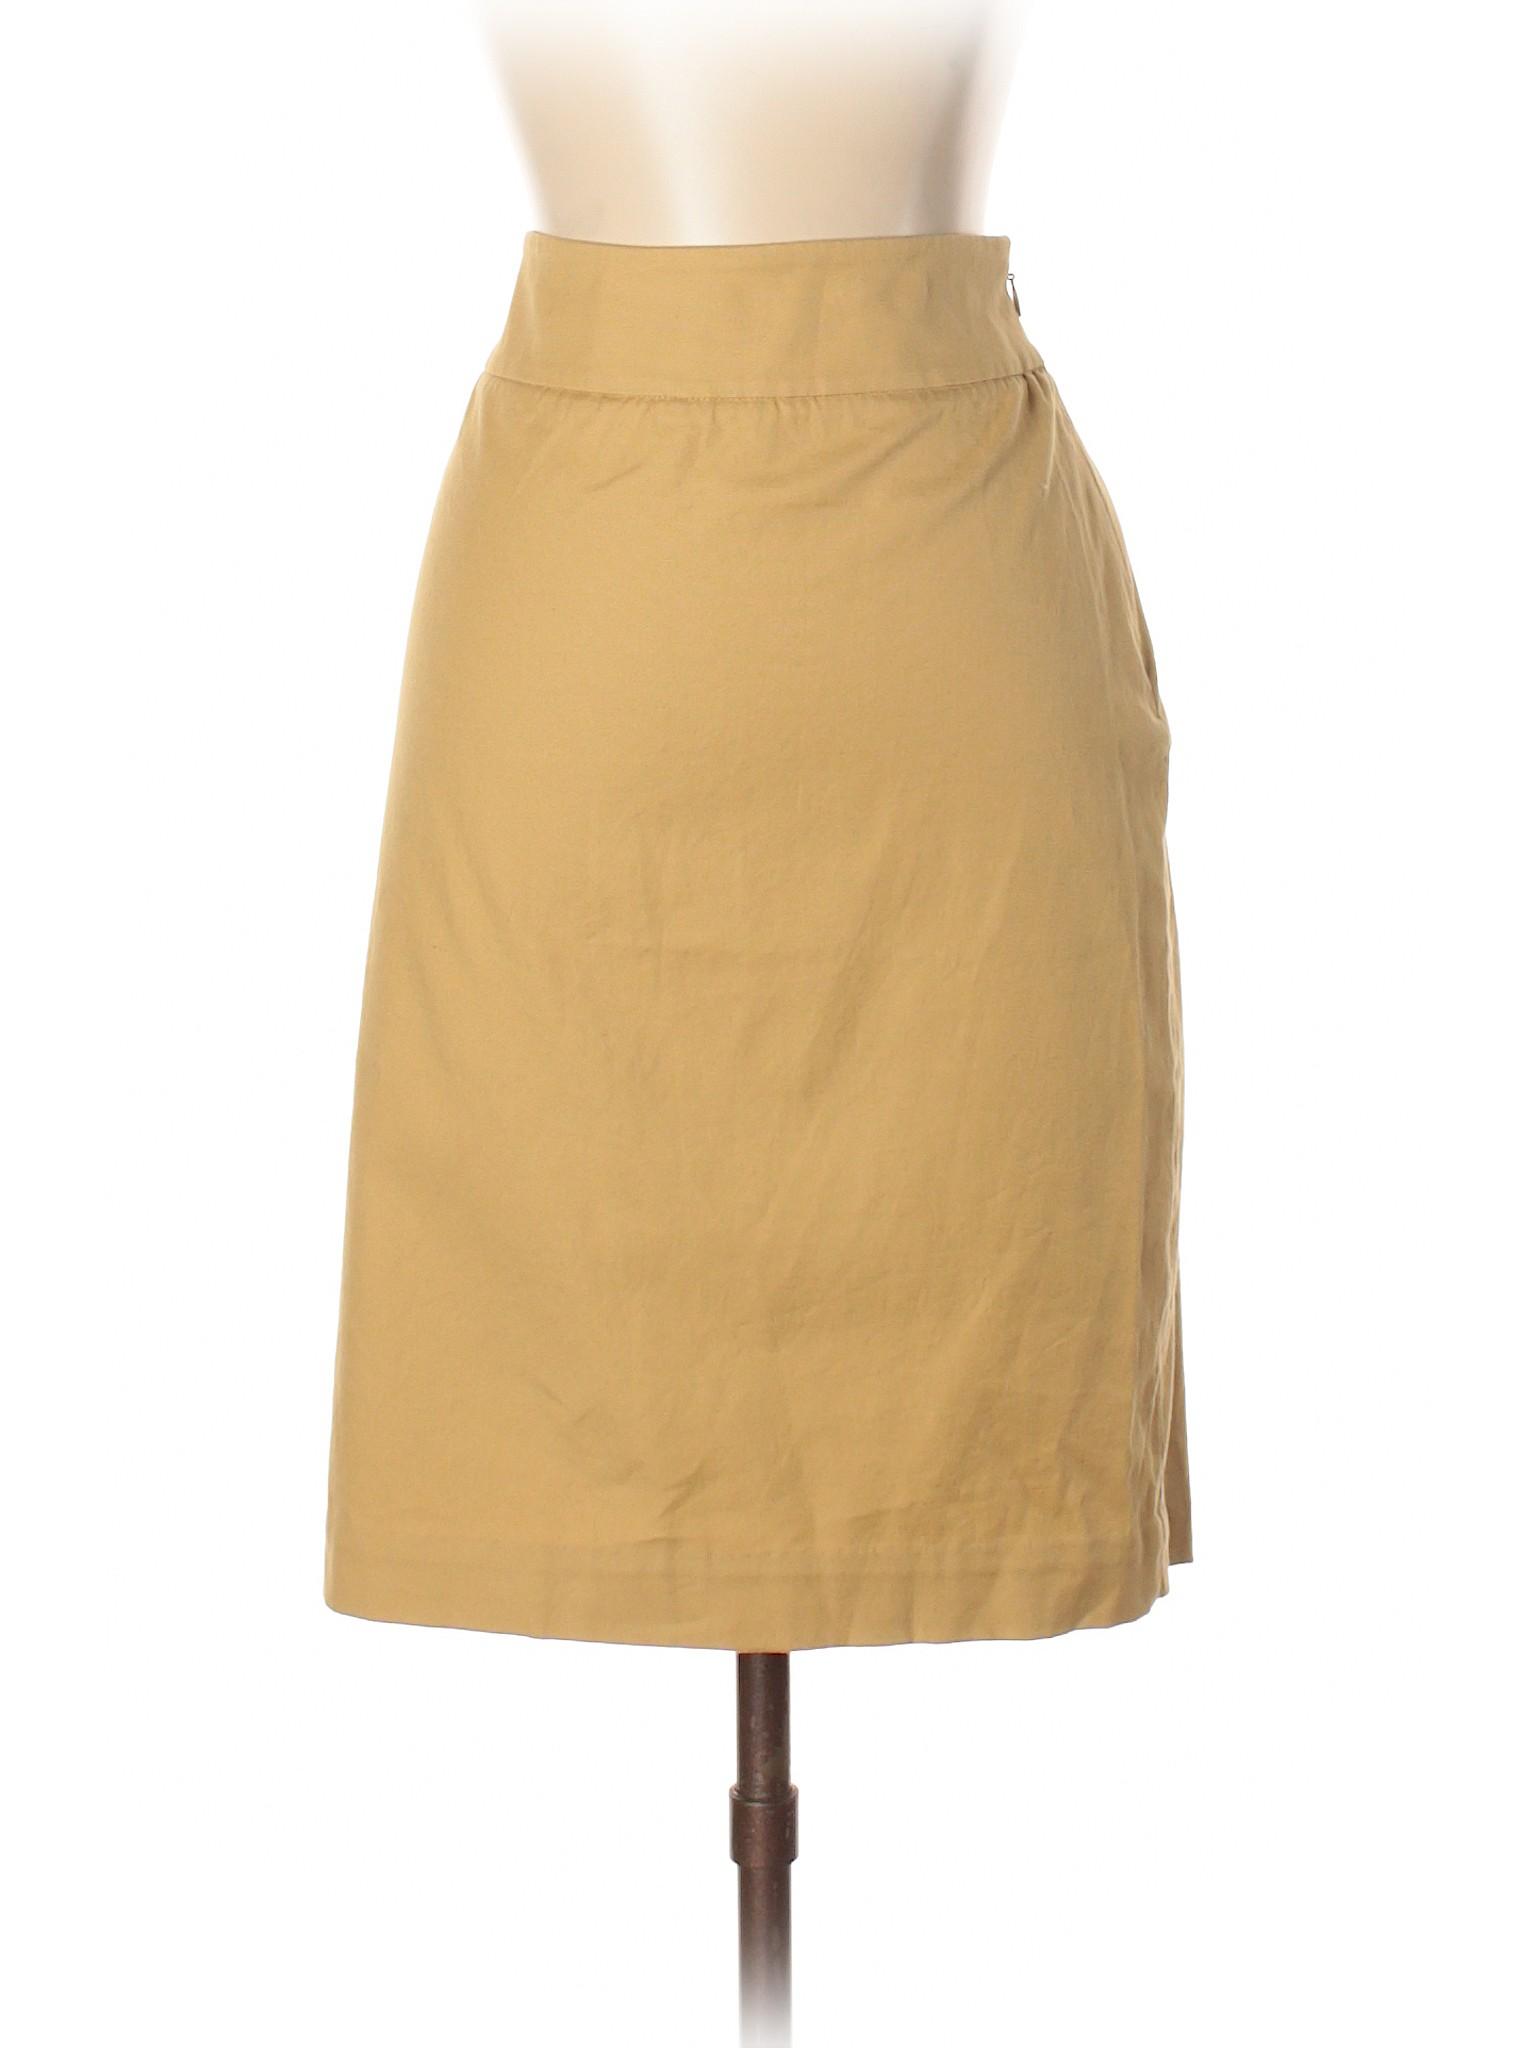 Boutique Boutique Skirt Casual Casual Skirt Boutique zHqct6wq